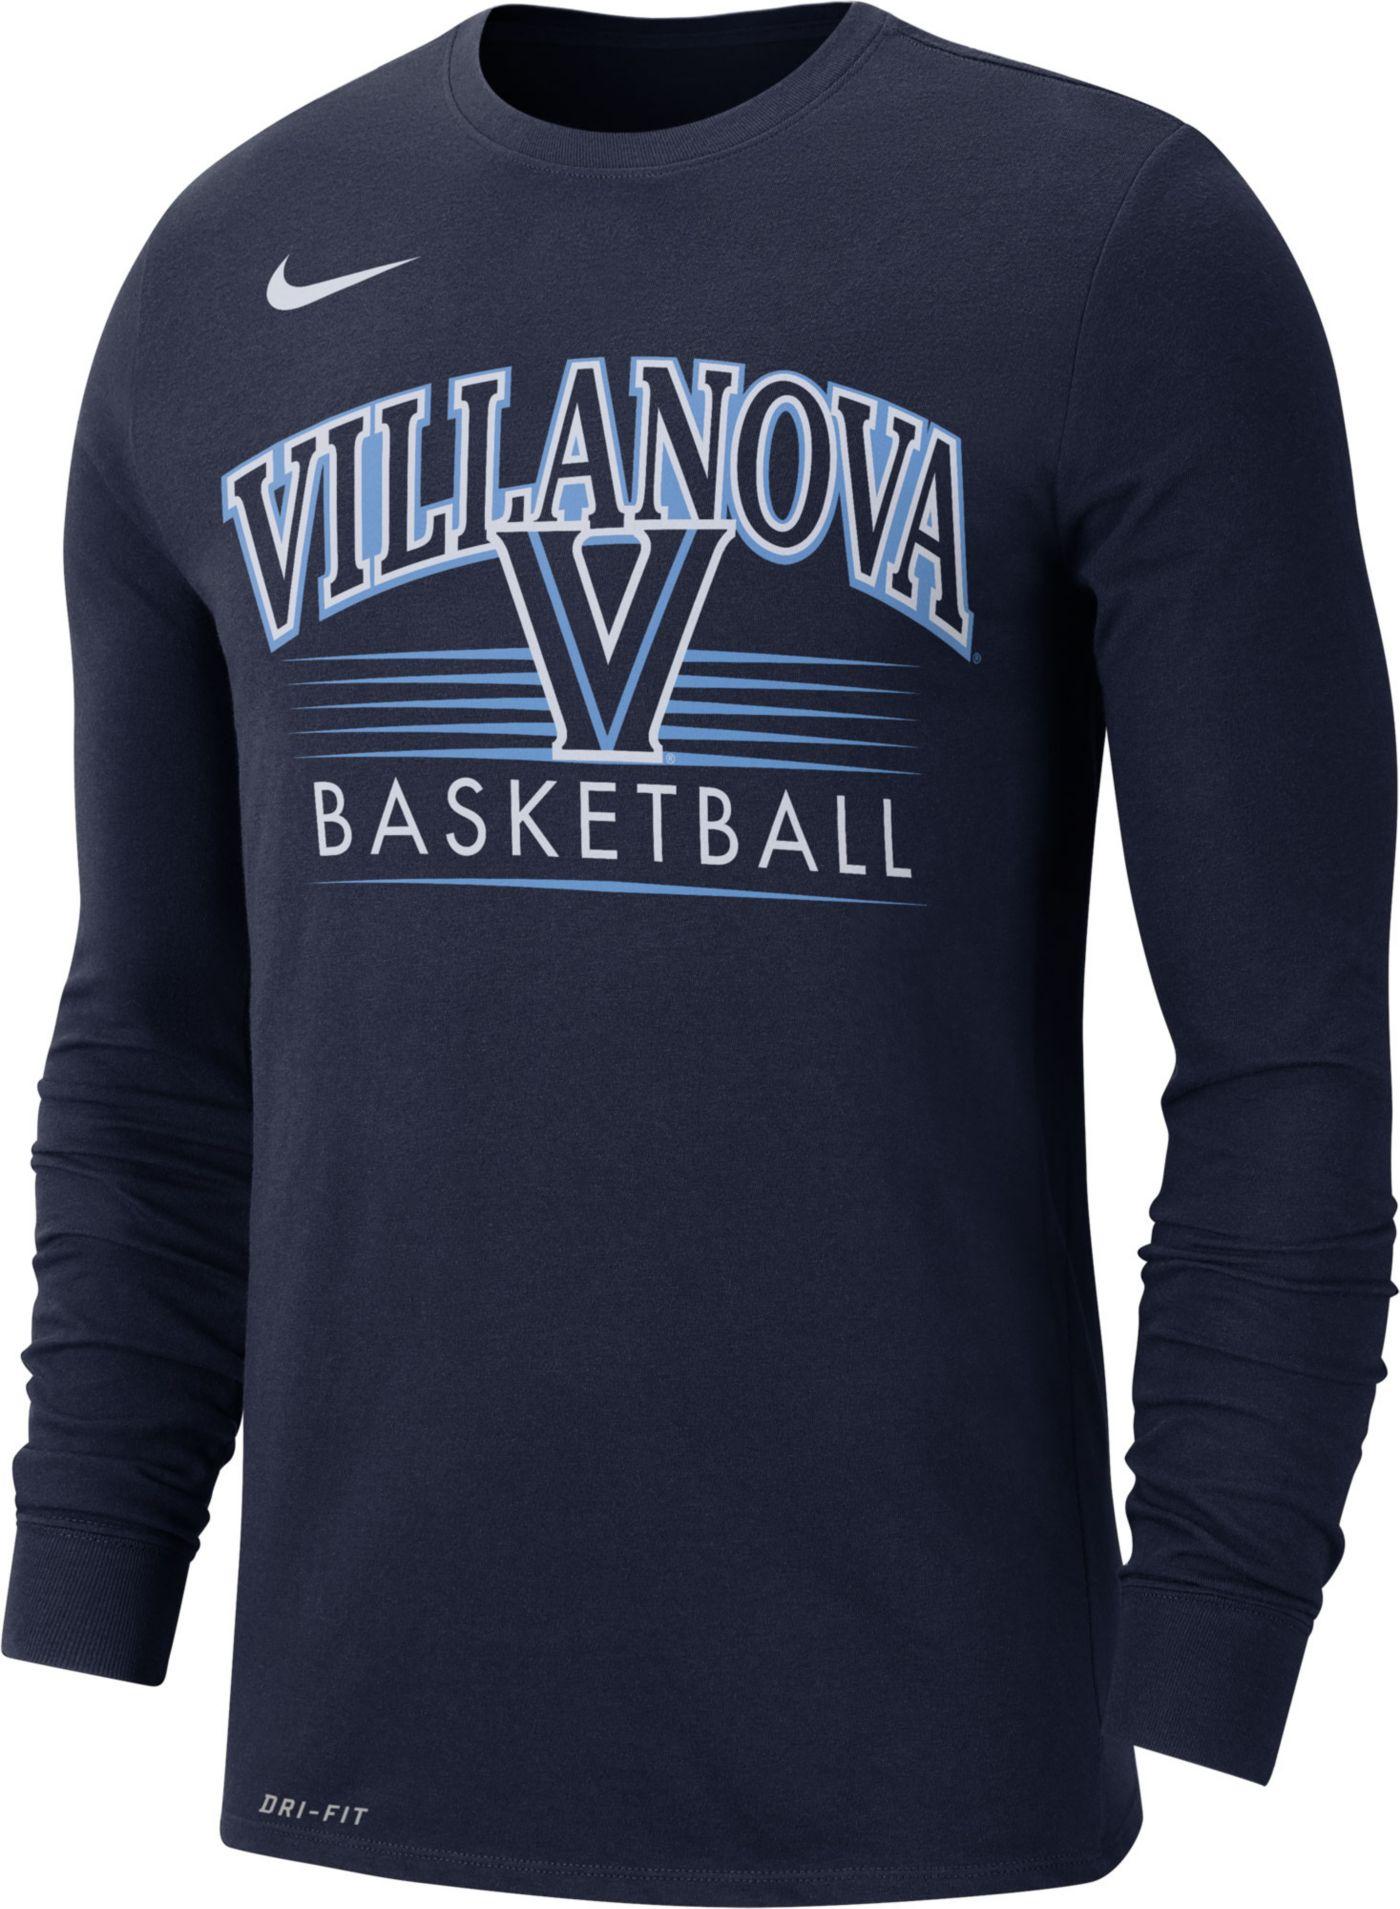 Nike Men's Villanova Wildcats Navy Dri-FIT Retro Long Sleeve Basketball T-Shirt